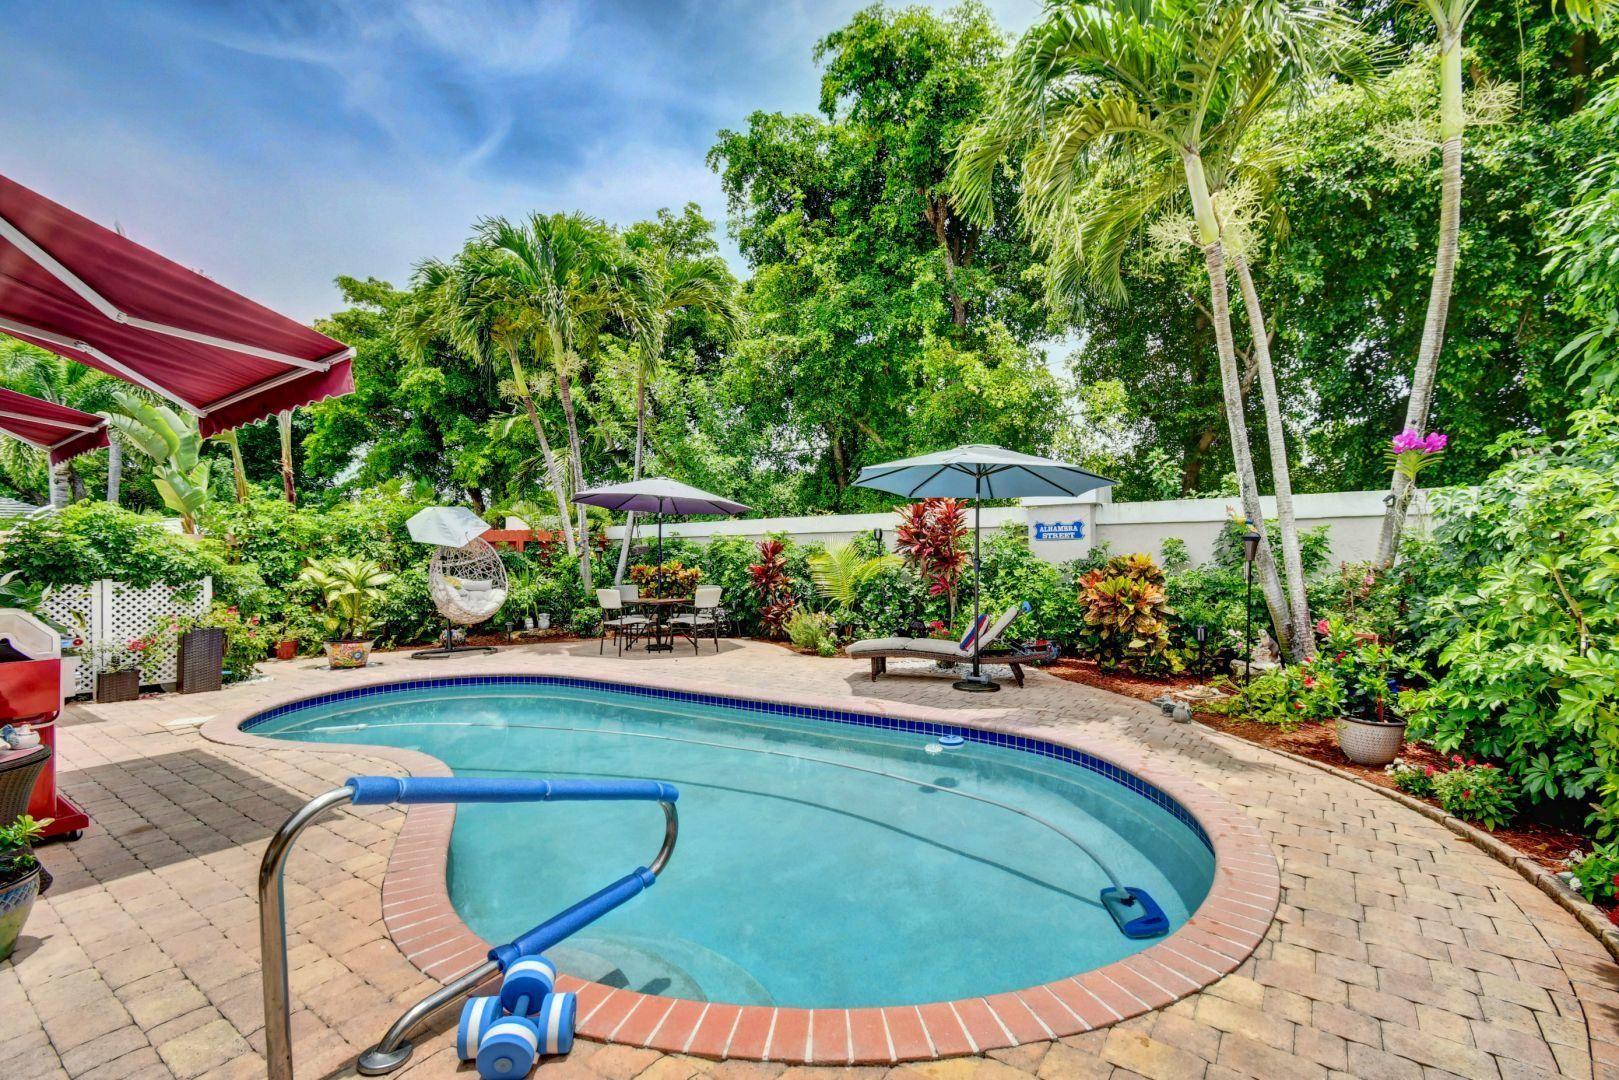 22830 Windsor Wood Court, Boca Raton, FL 33433 - #: RX-10627608